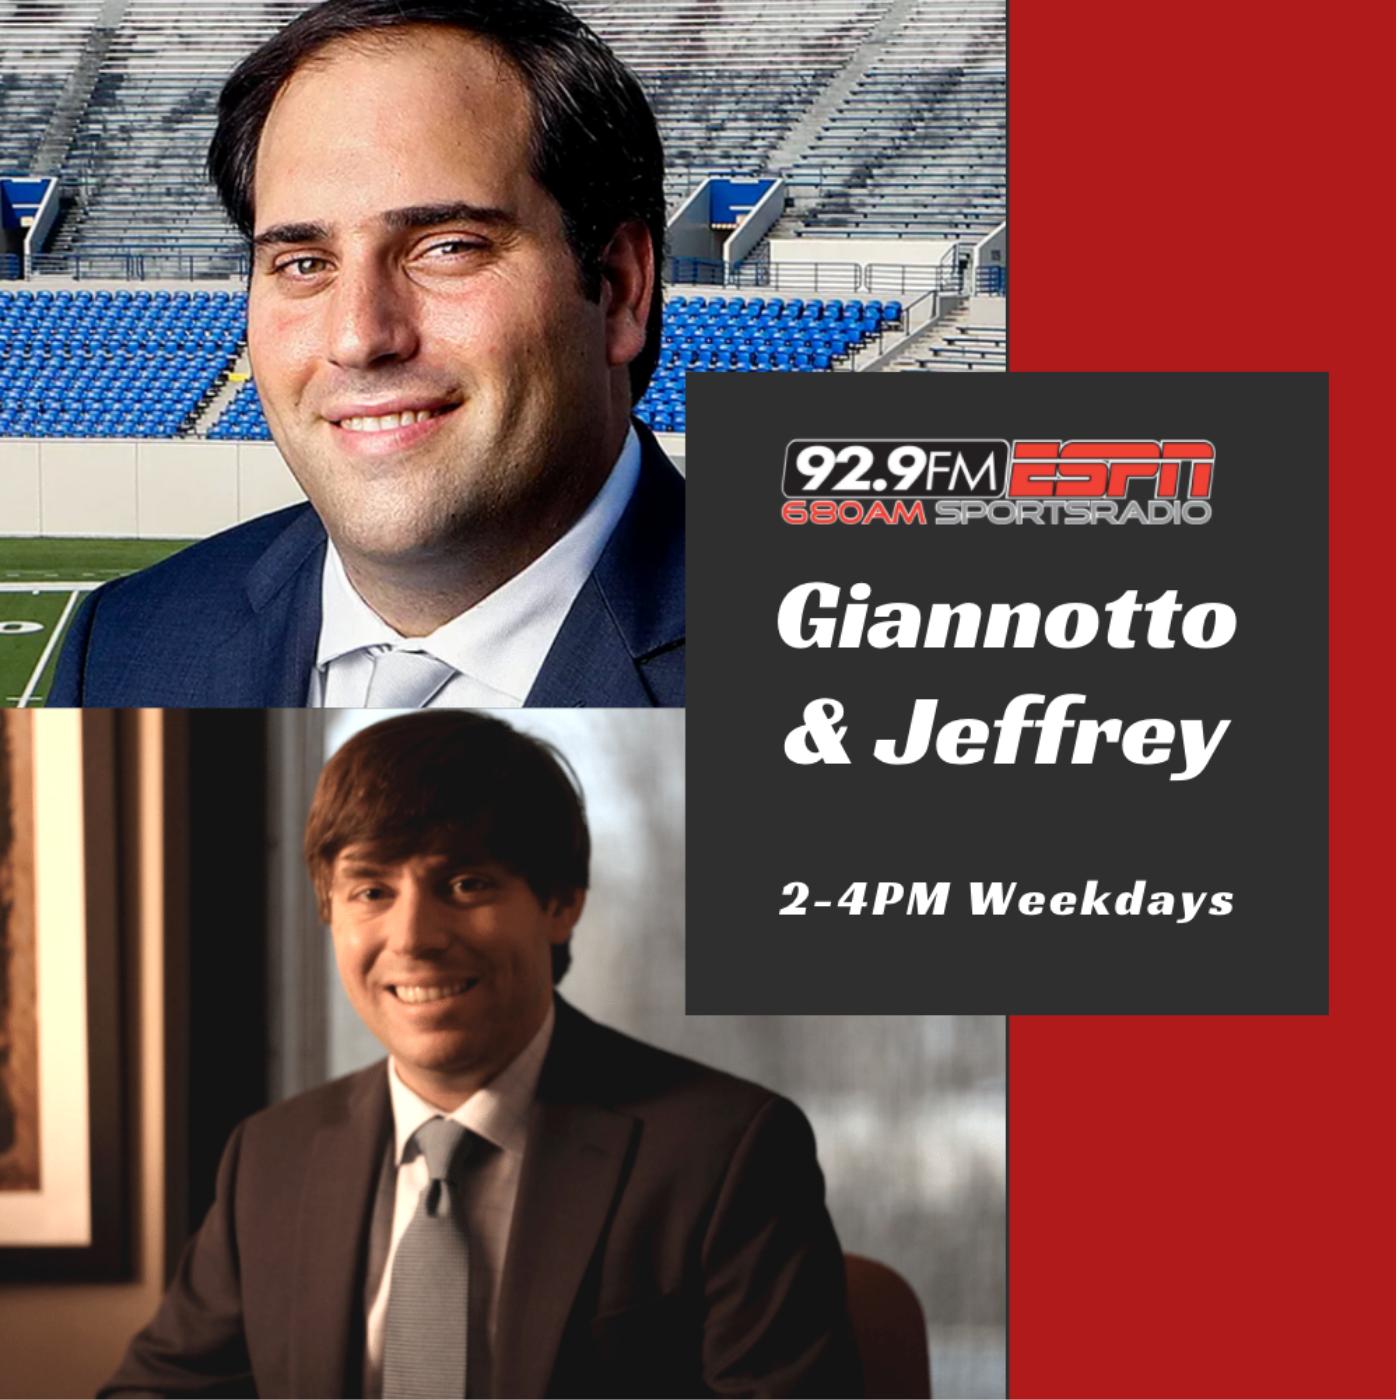 Giannotto & Jeffrey